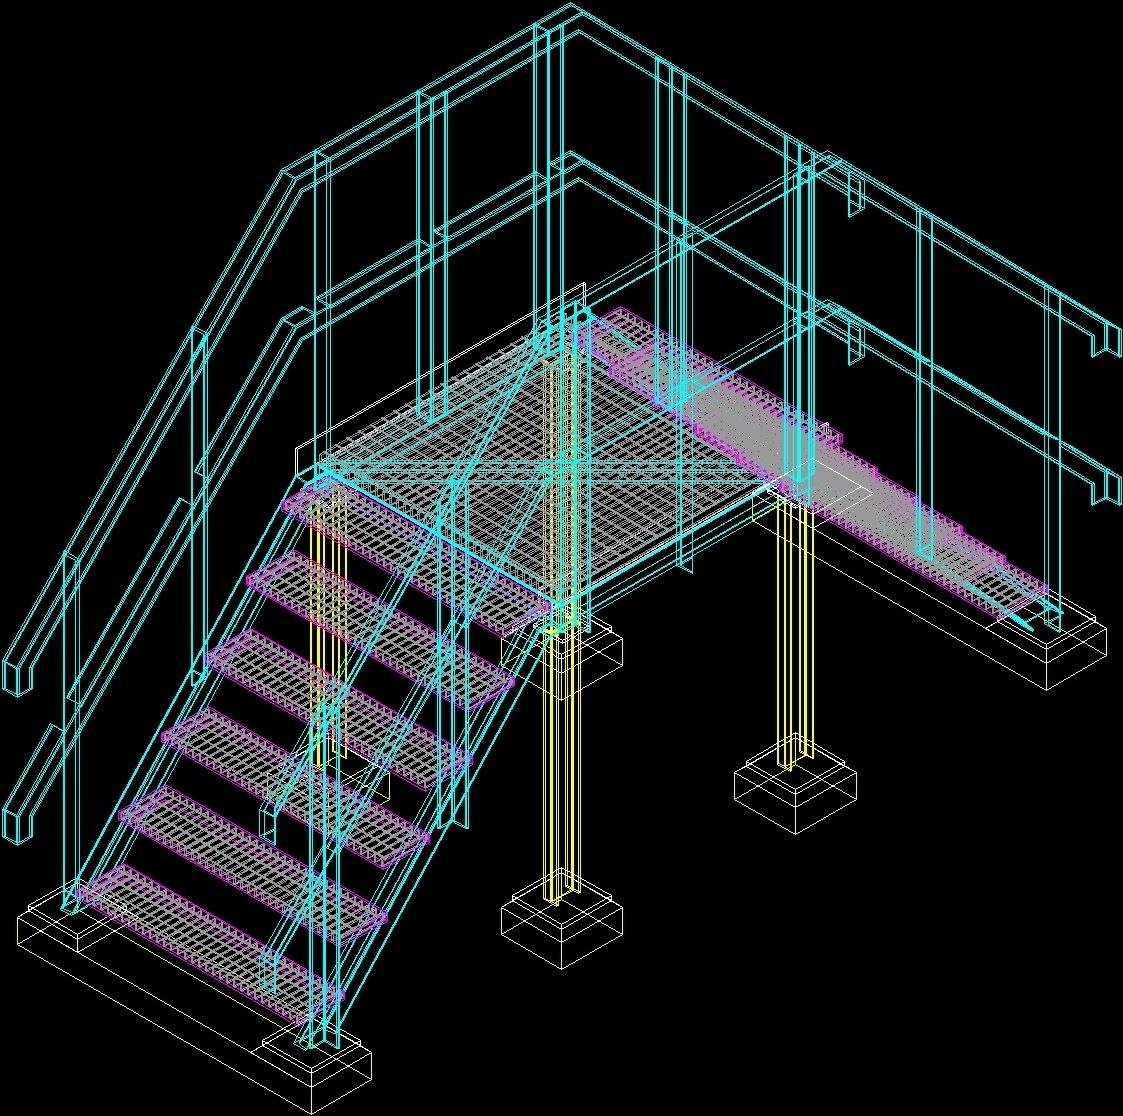 Catwalk Structure 3d Dwg Model For Autocad Designs Cad